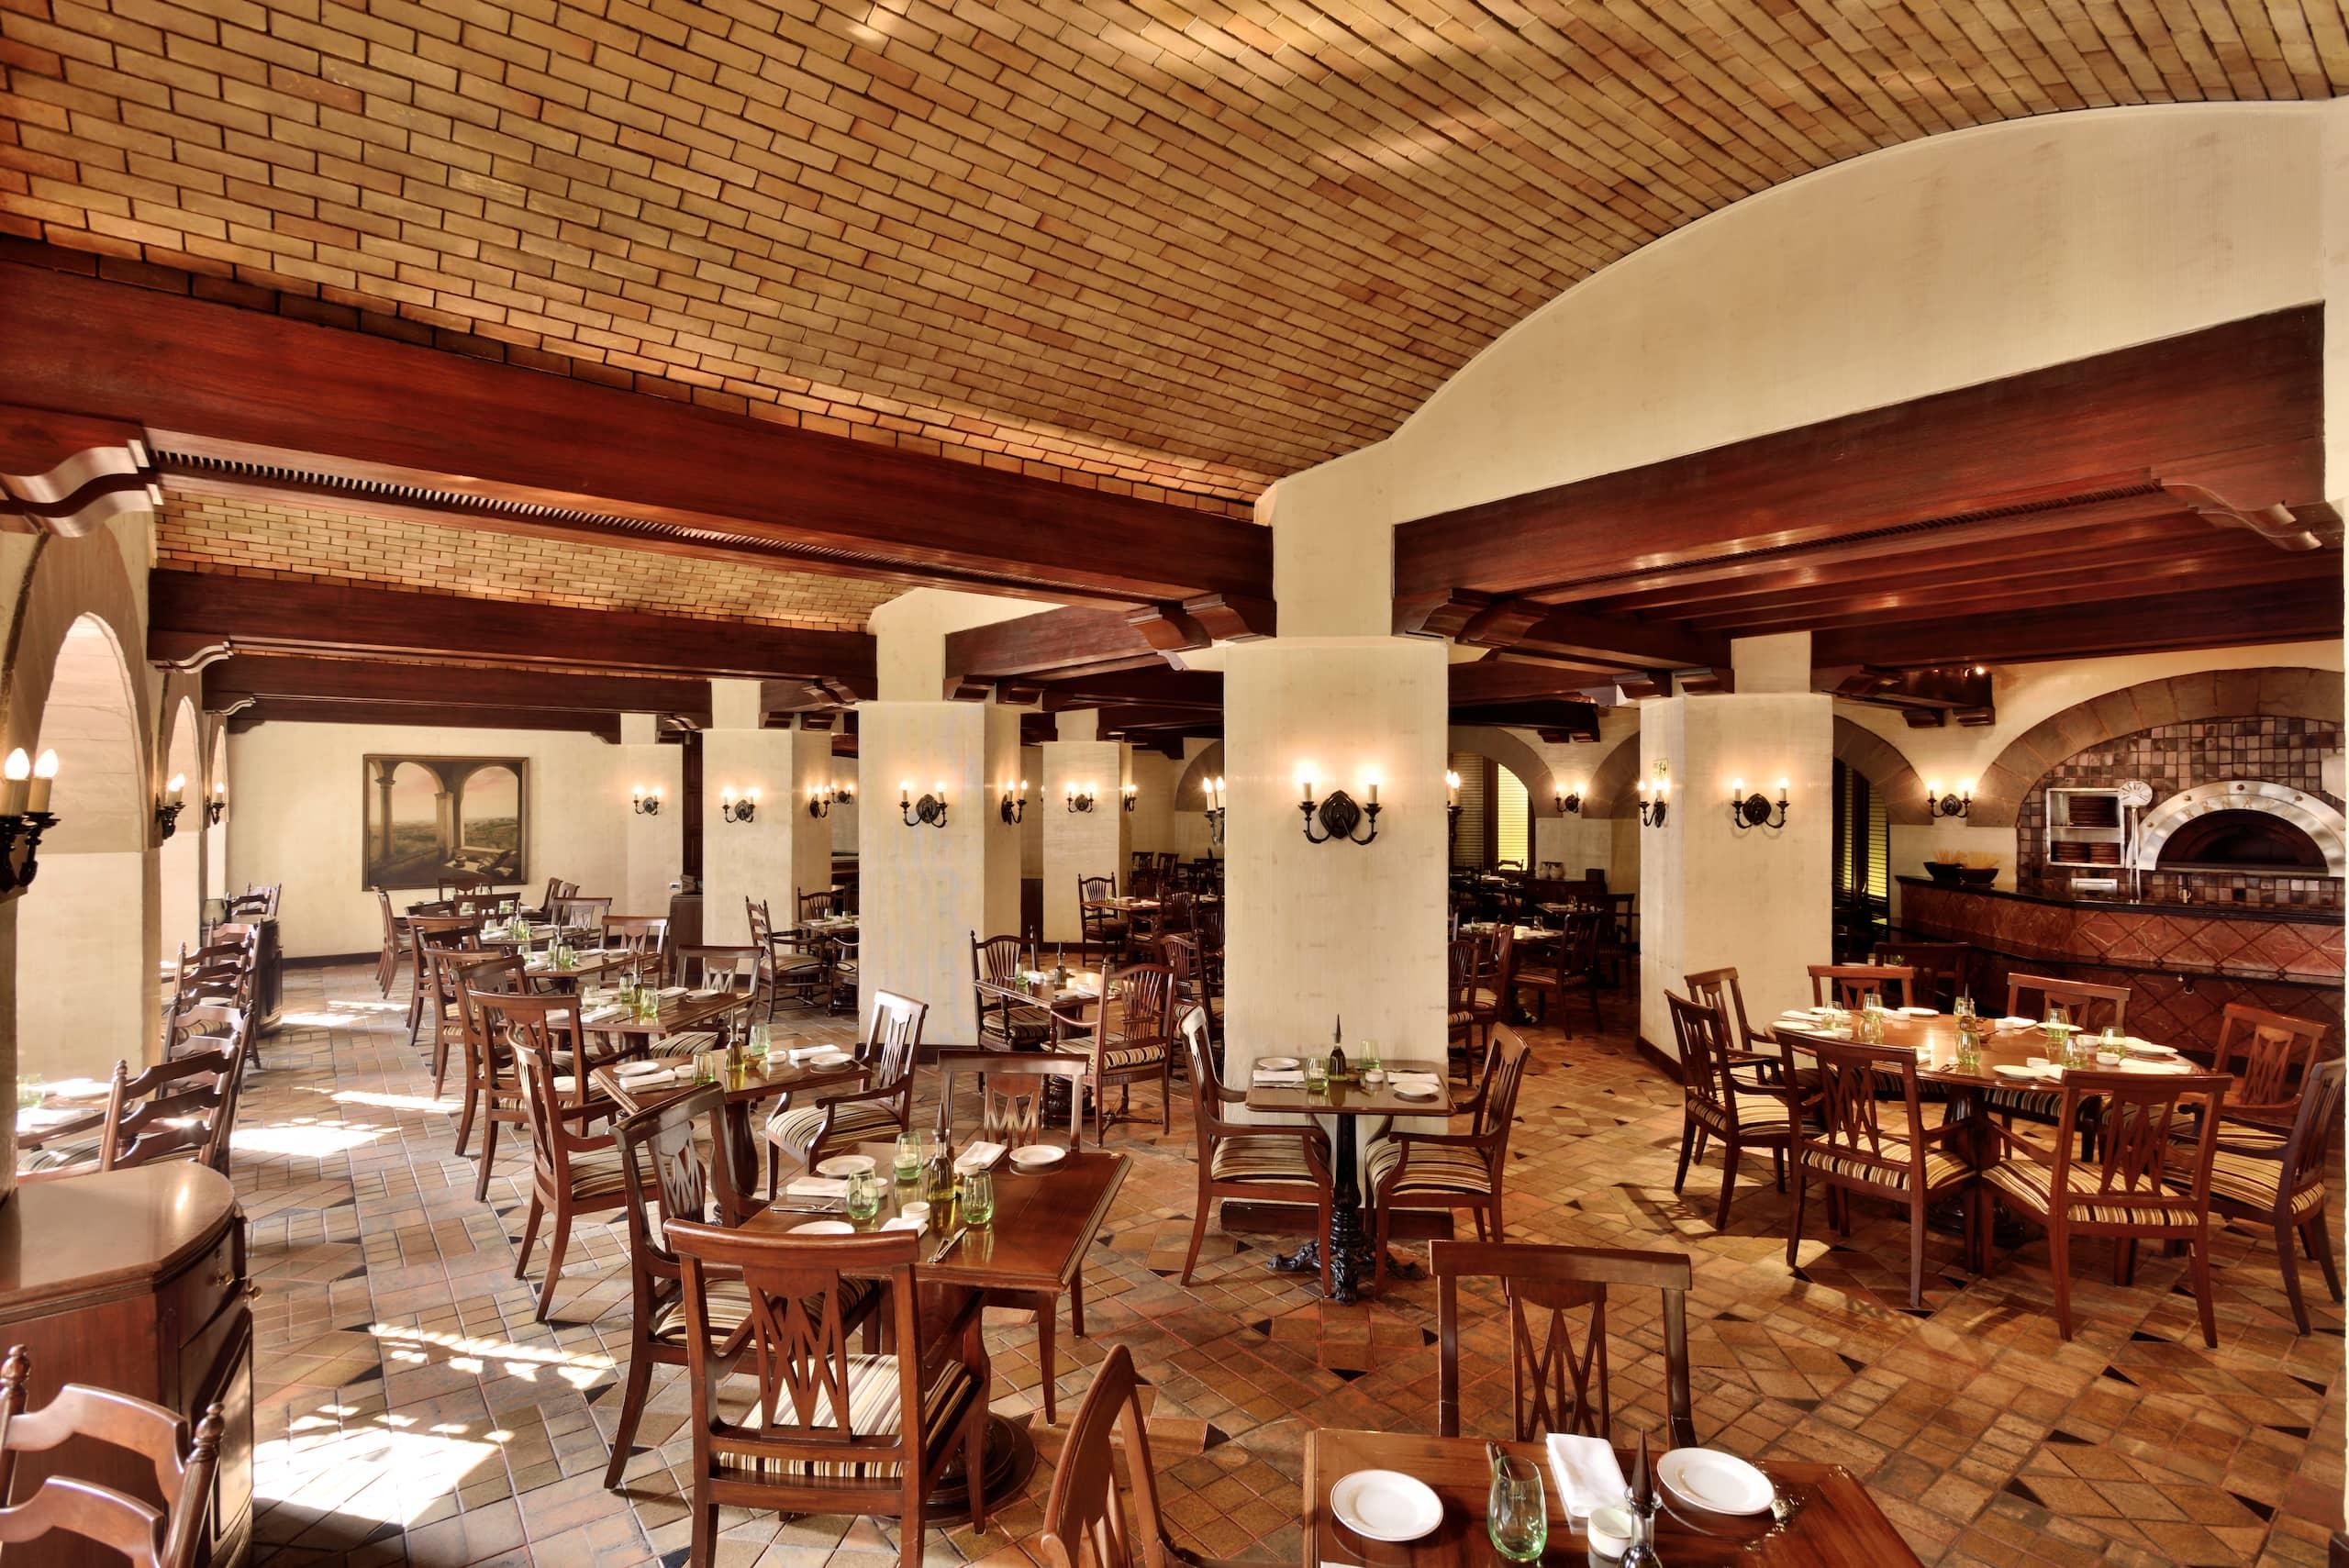 Best Restaurants & Bar in New Delhi - Best Chinese and Italian ...